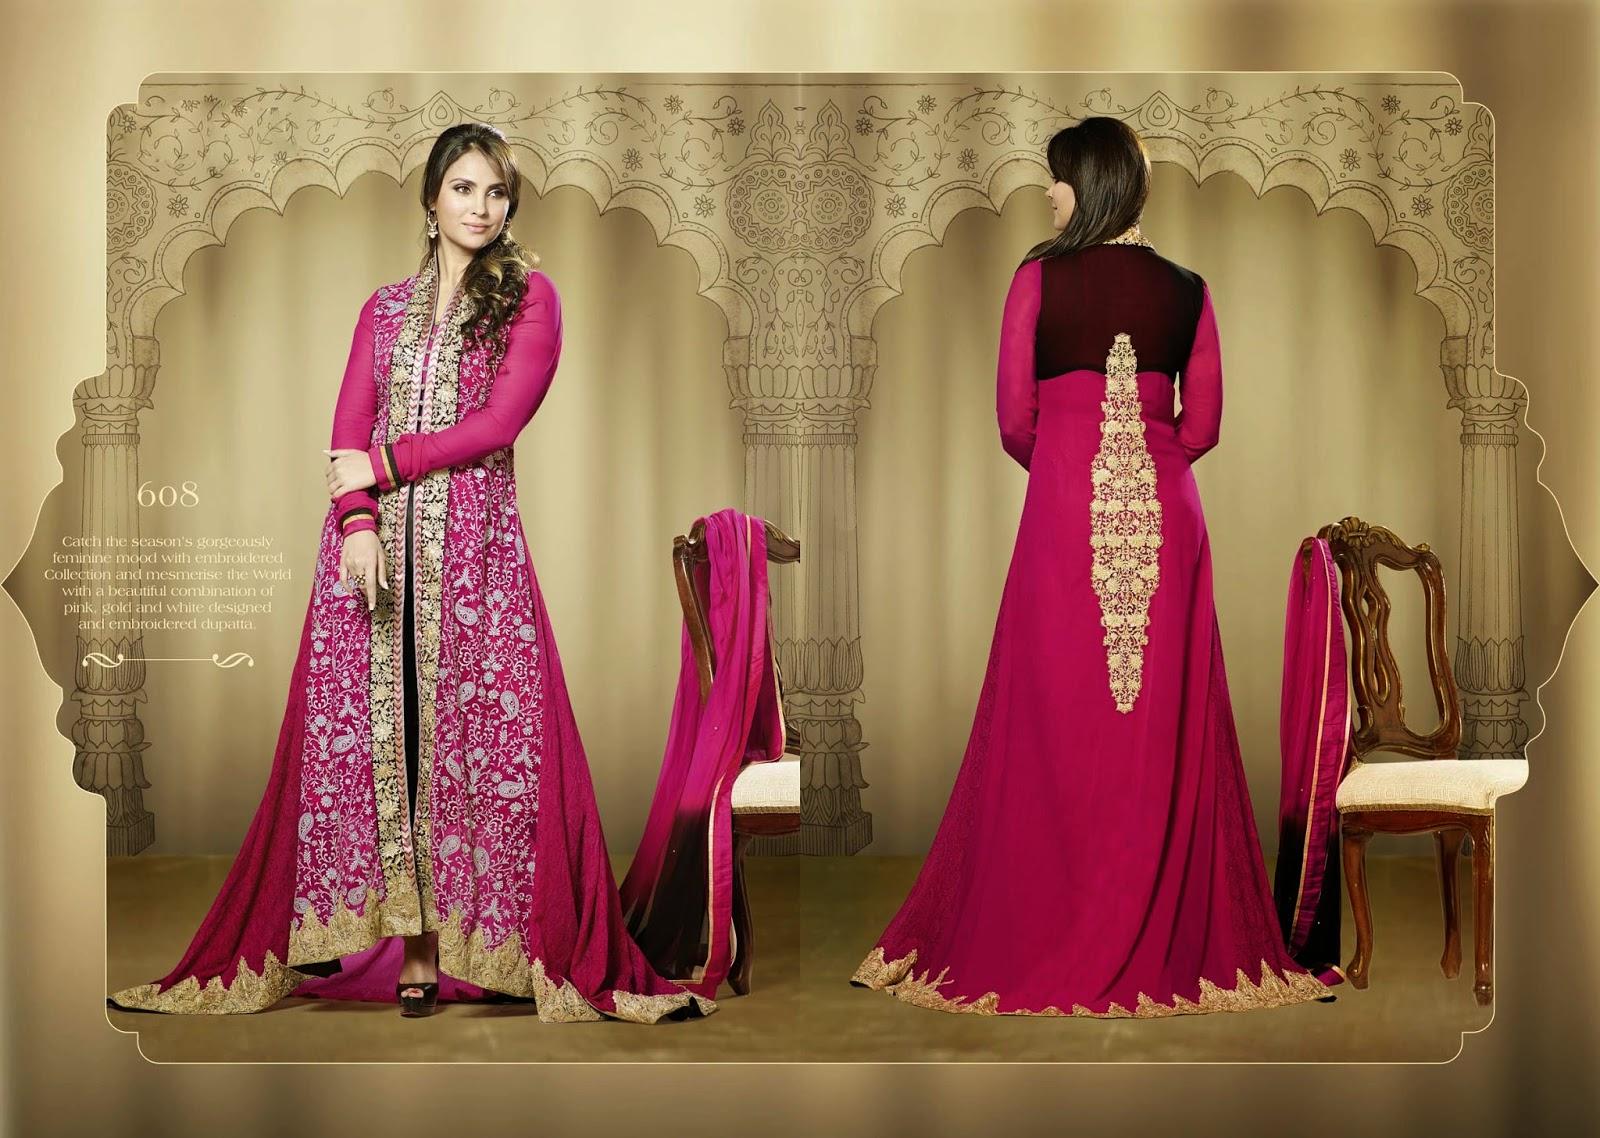 734873d29a Wholesaler Of Indian Ethnic Women Wear: Lara Dutta Stylish ...